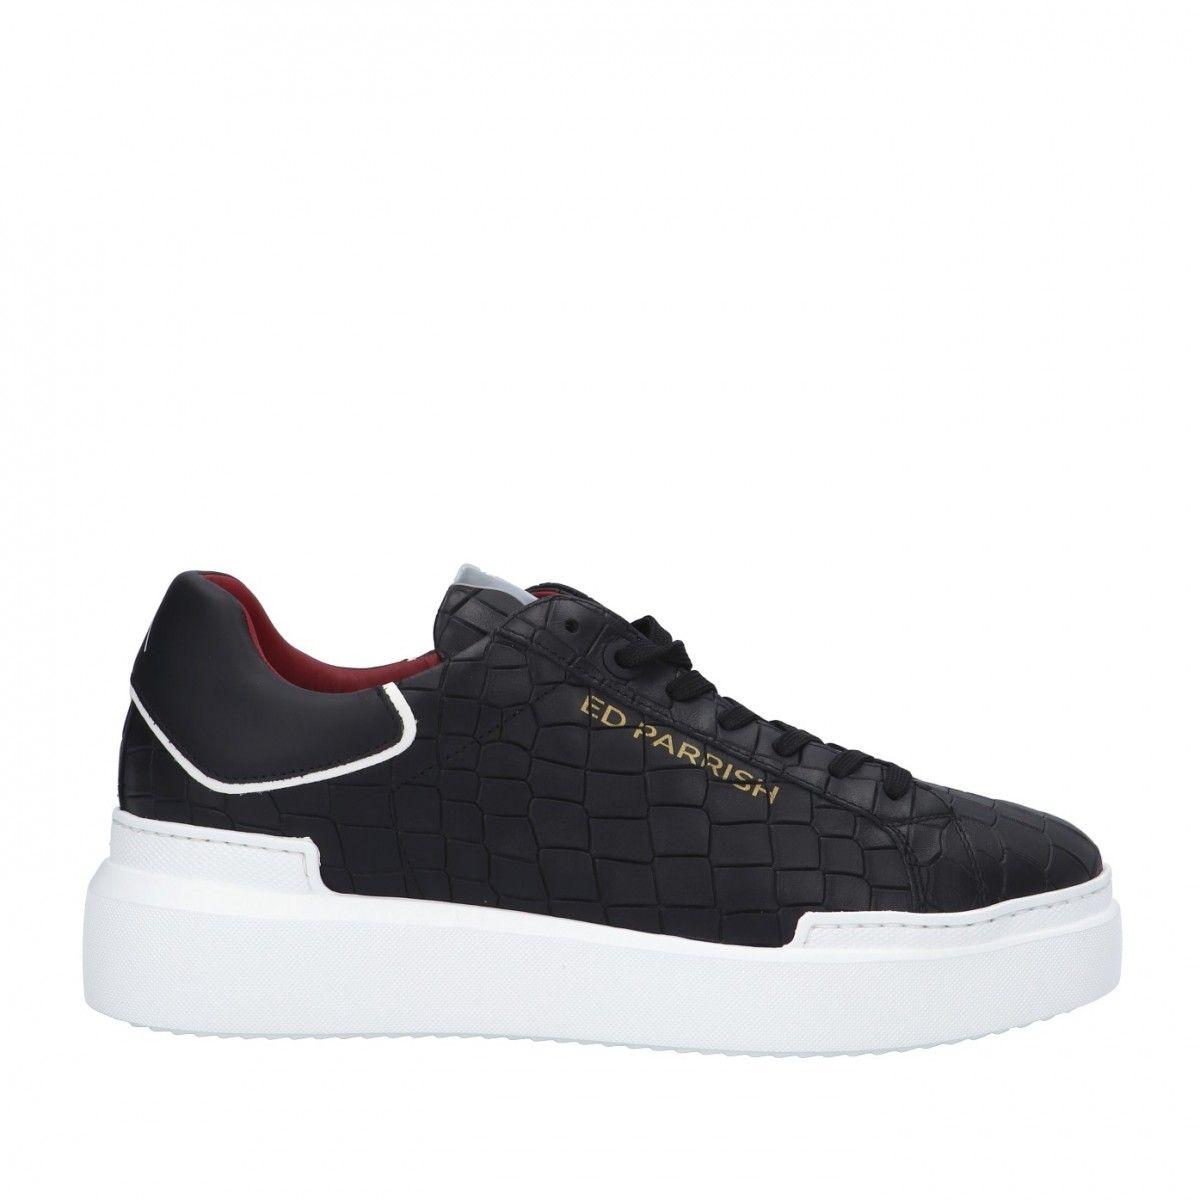 Ed parrish Sneaker Nero Gomma CKLU-CV31